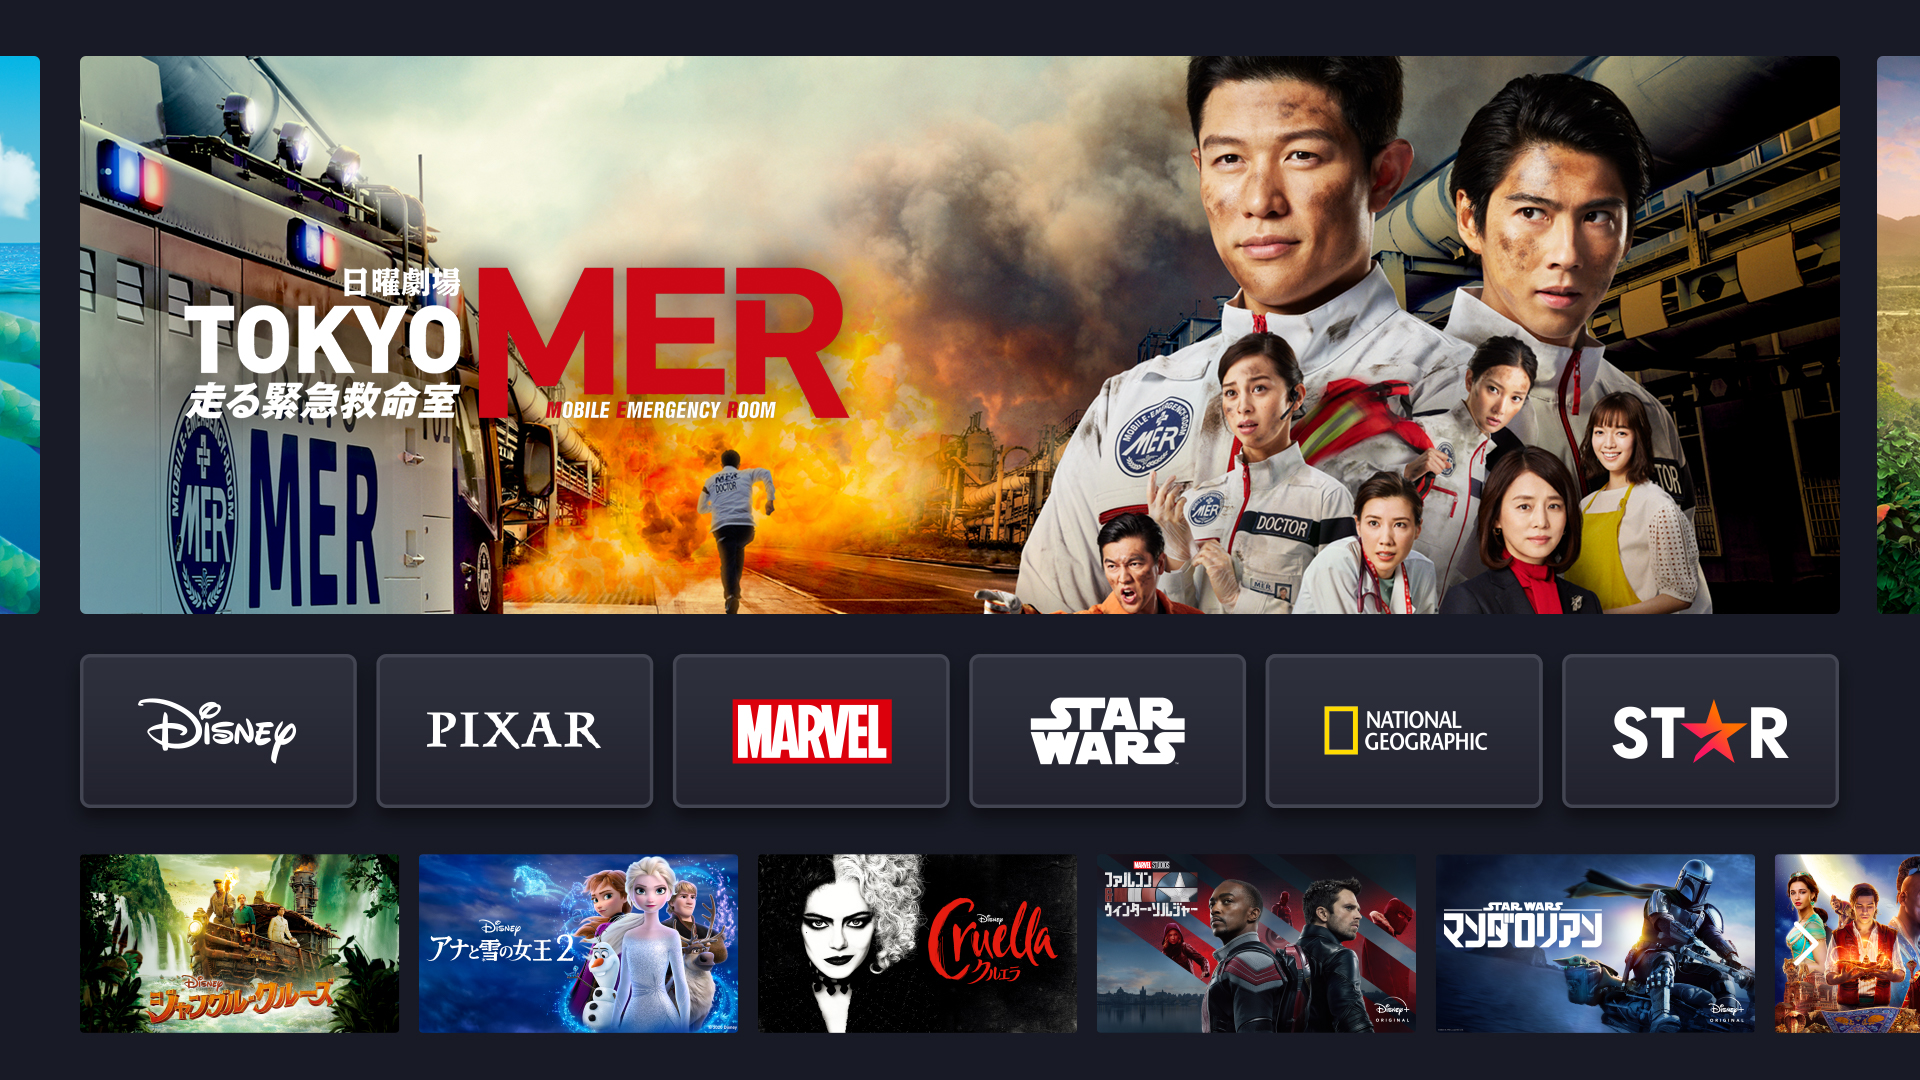 TOKYO MER Disney Plus / TBS